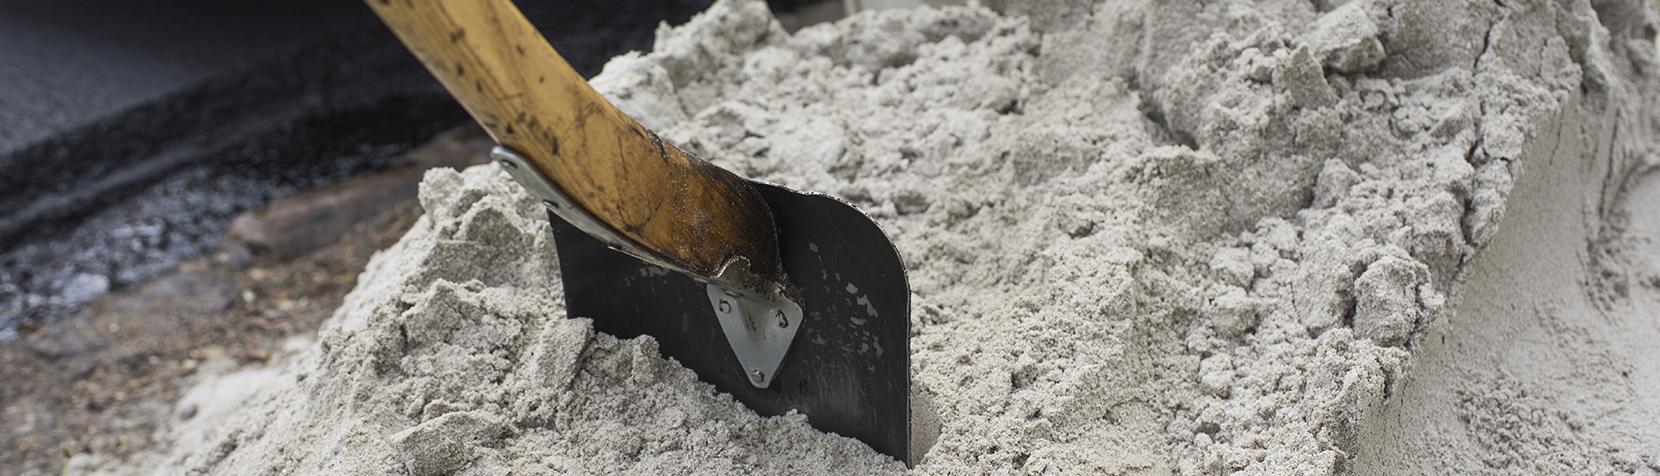 Sand og skovl